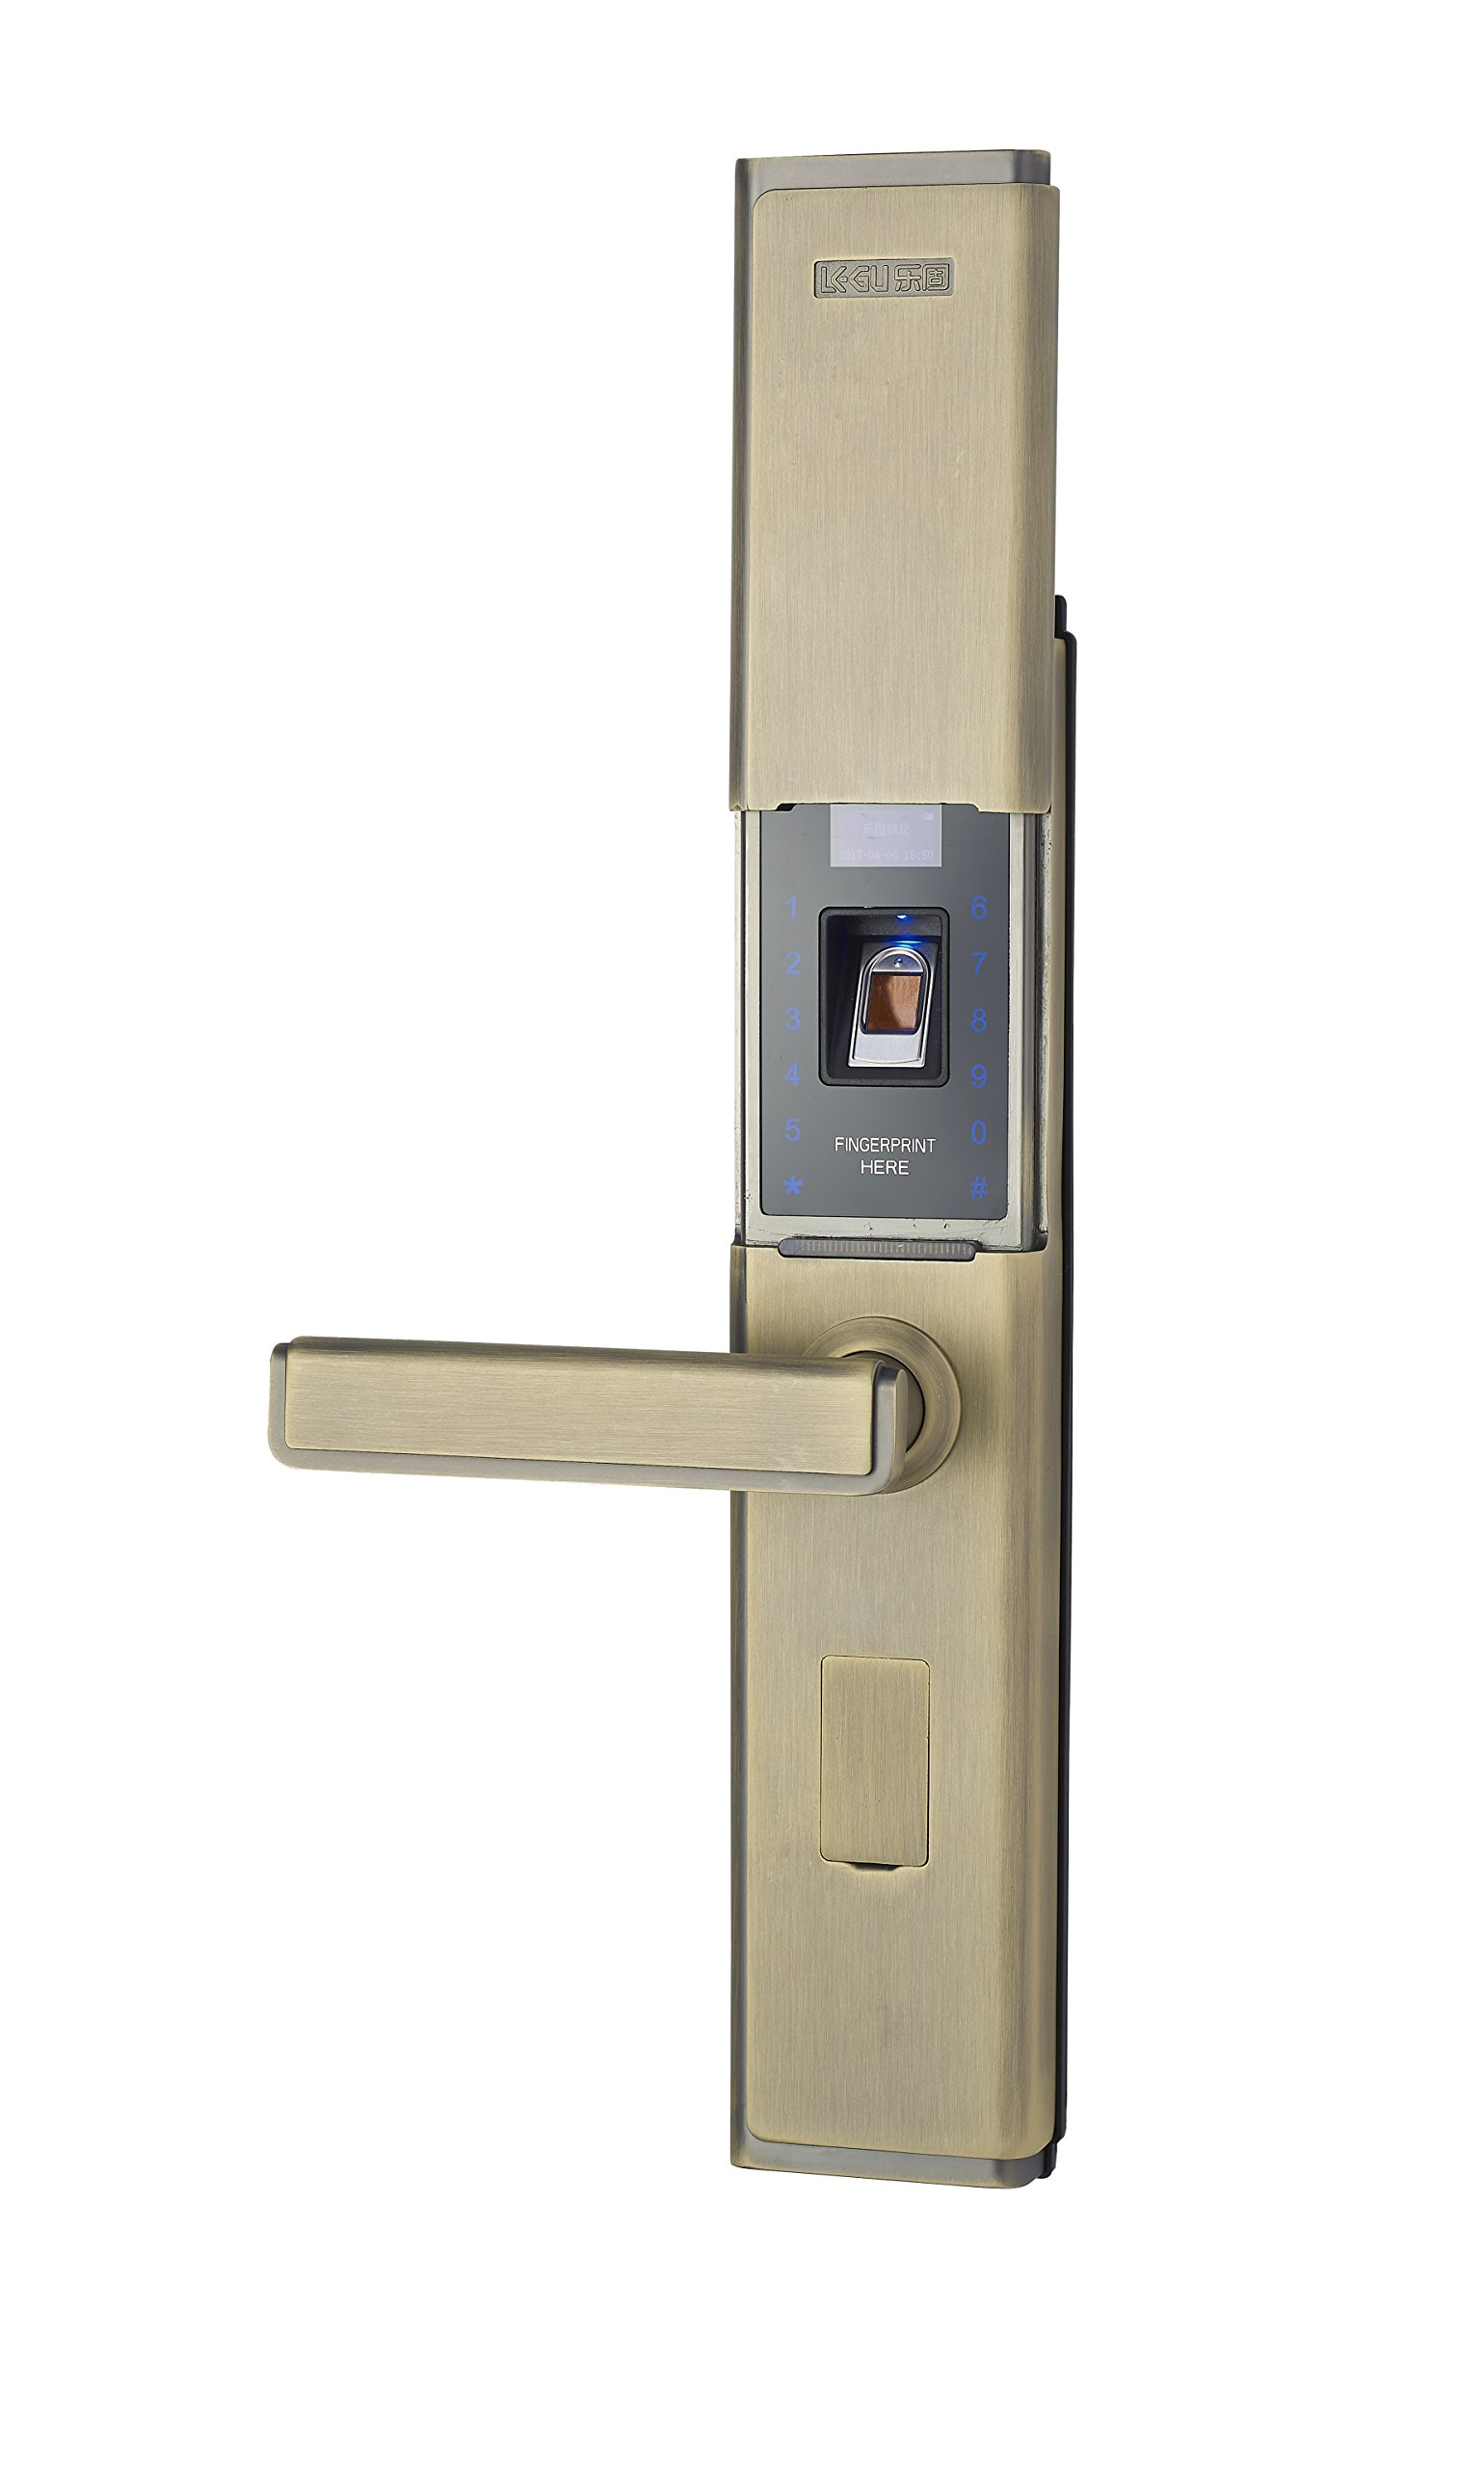 LEGU Fingerprint and Touchscreen Keyless Smart Lever Lock for Door fingerprint+password+card+key/Security intelligent anti-theft lock (Left handed) by LEGU (Image #9)